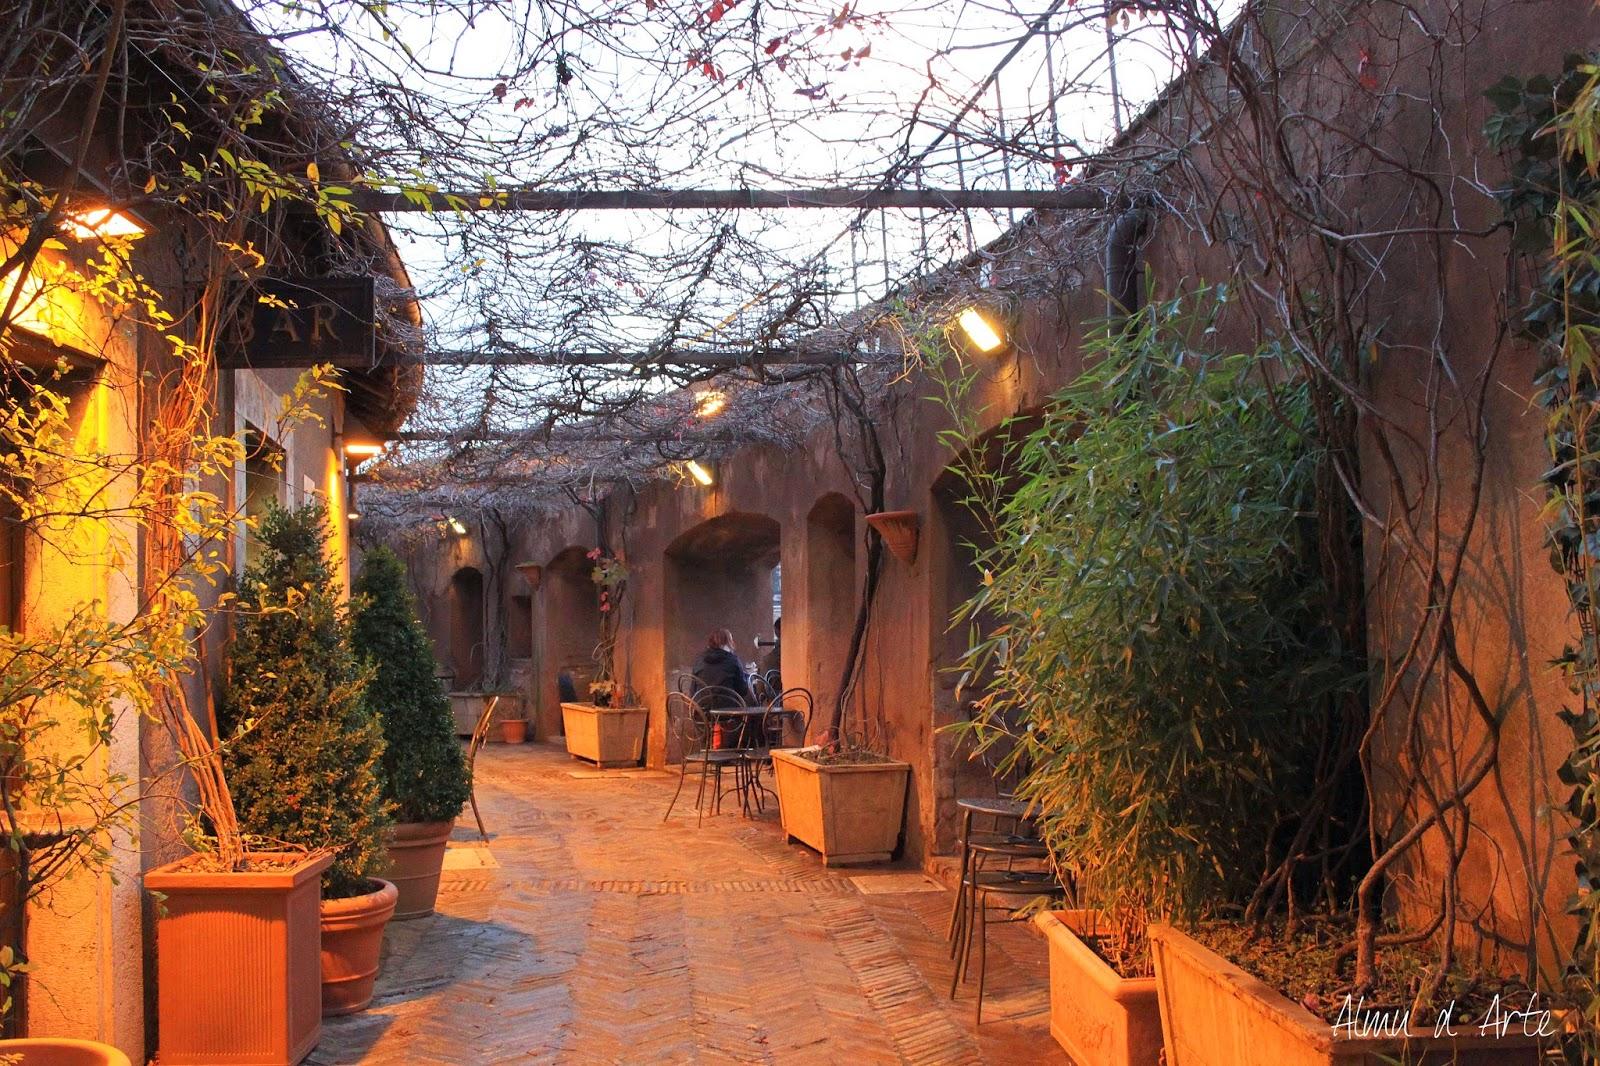 Interior del Castillo del Ángel